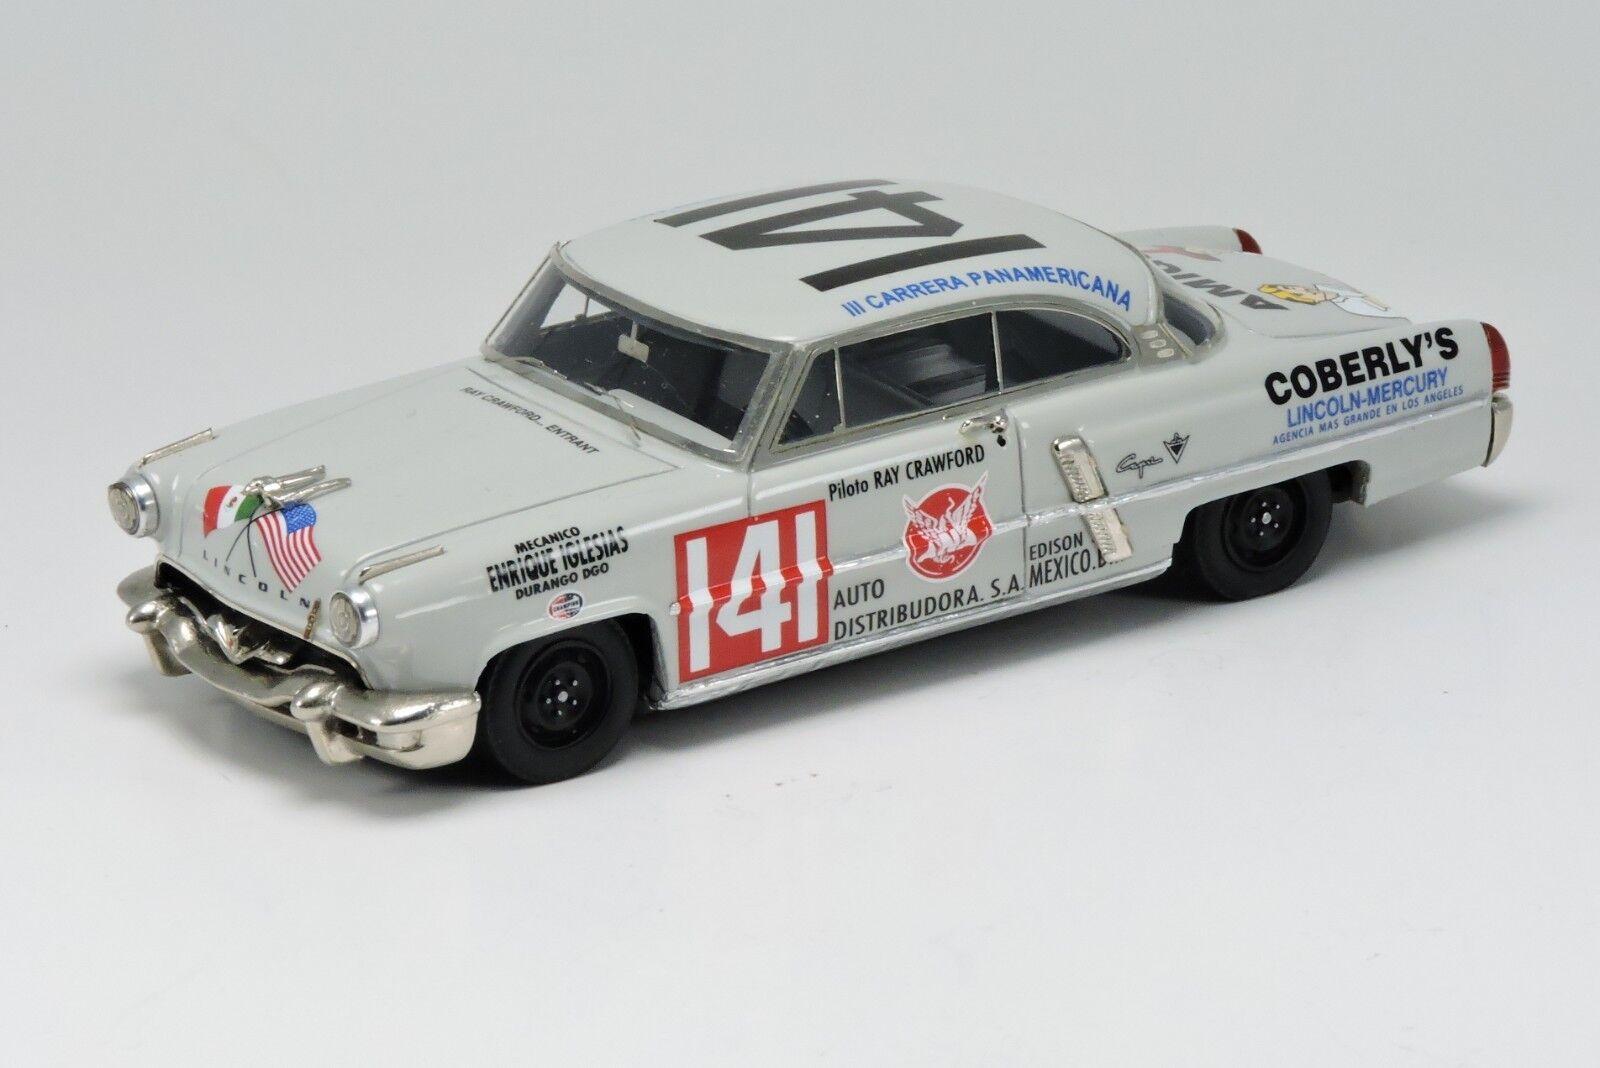 Kit Lincoln Capri III Carrera Panamericana 1952  141 - Arena Models kit